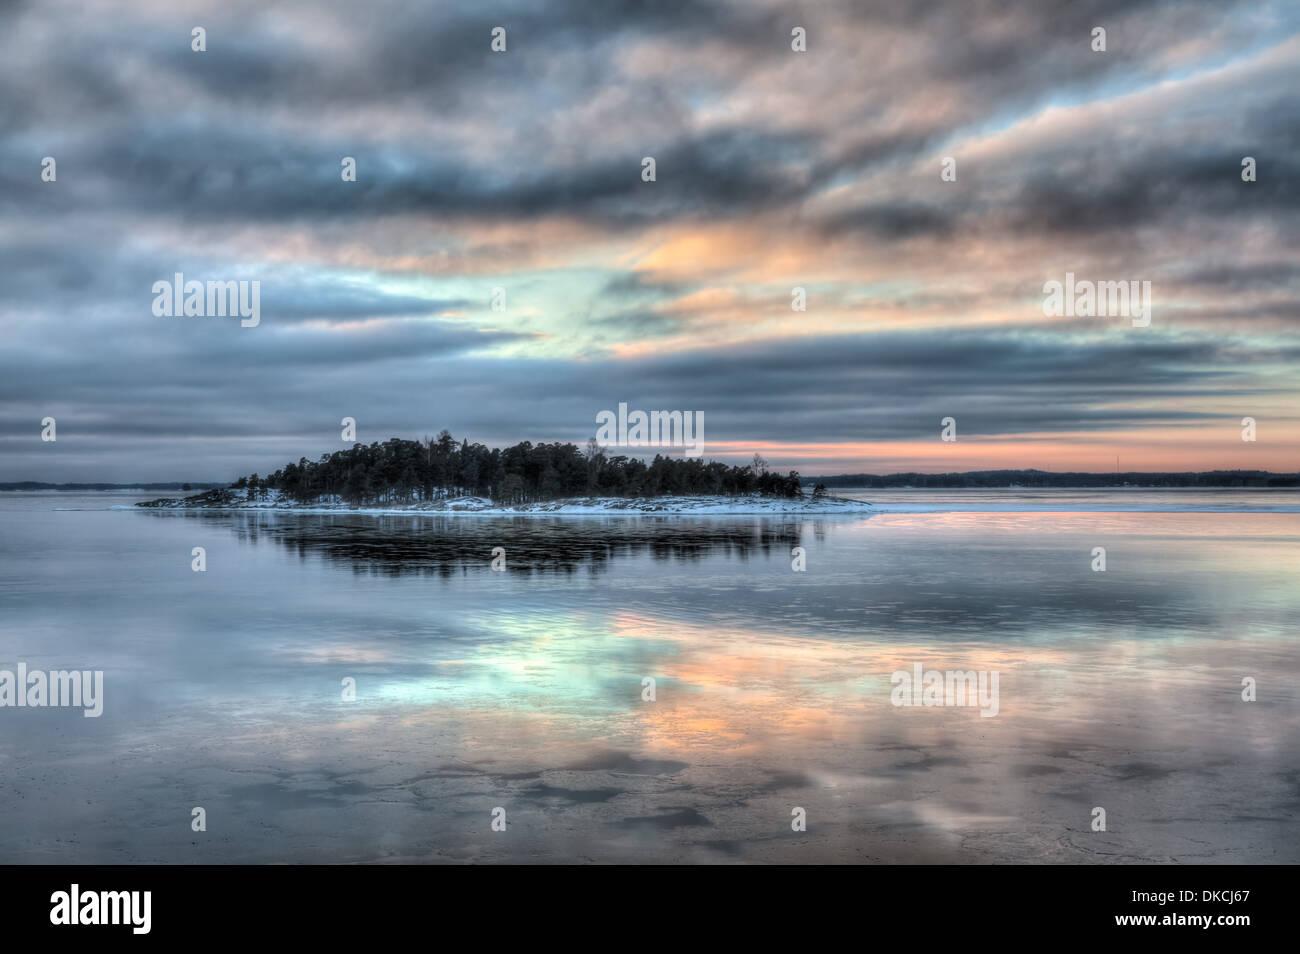 Baltic Sea at winter, Finland - Stock Image